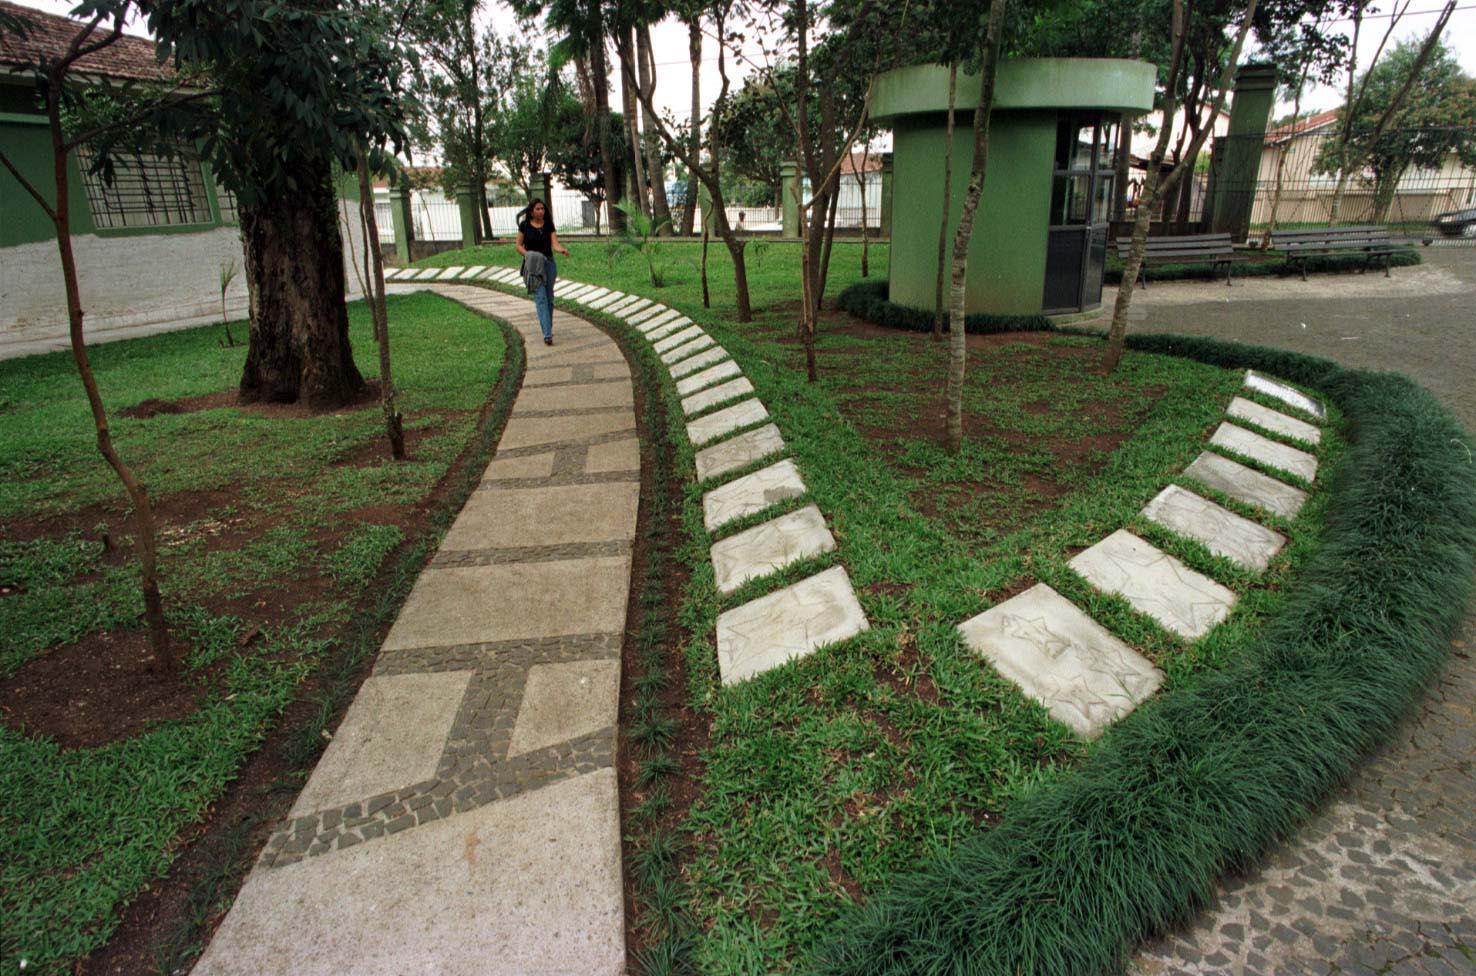 Museu de História Natural de Curitiba